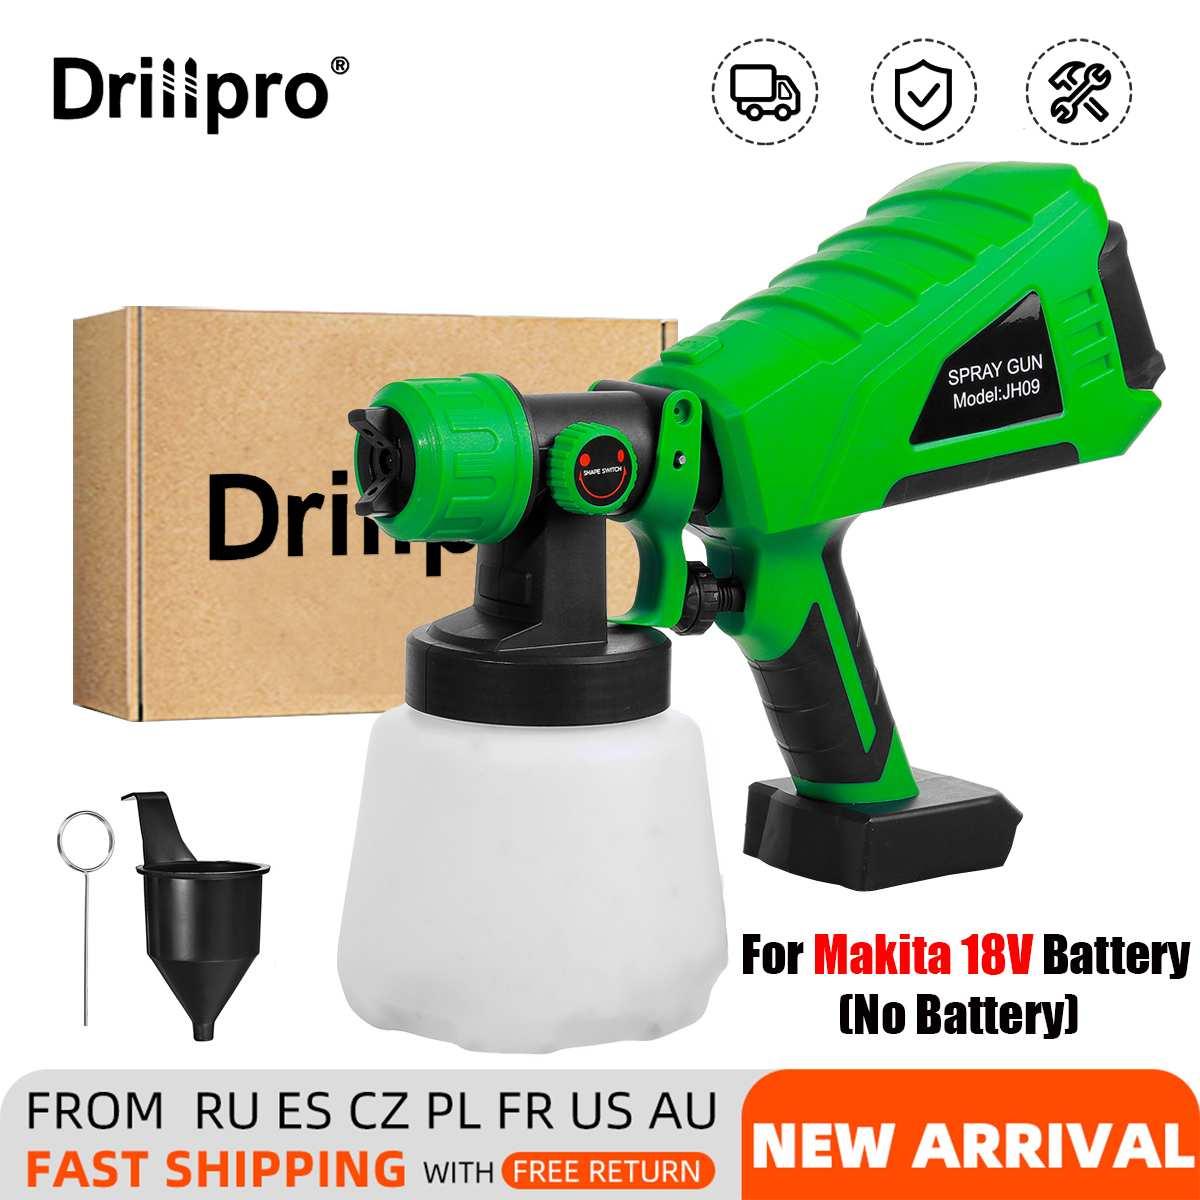 Drillpro 1000 مللي بندقية رذاذ كهربائية لاسلكية المنزلية رشاش دهان البخاخة فوهة ضبط رش السيارة لبطارية ماكيتا 18 فولت